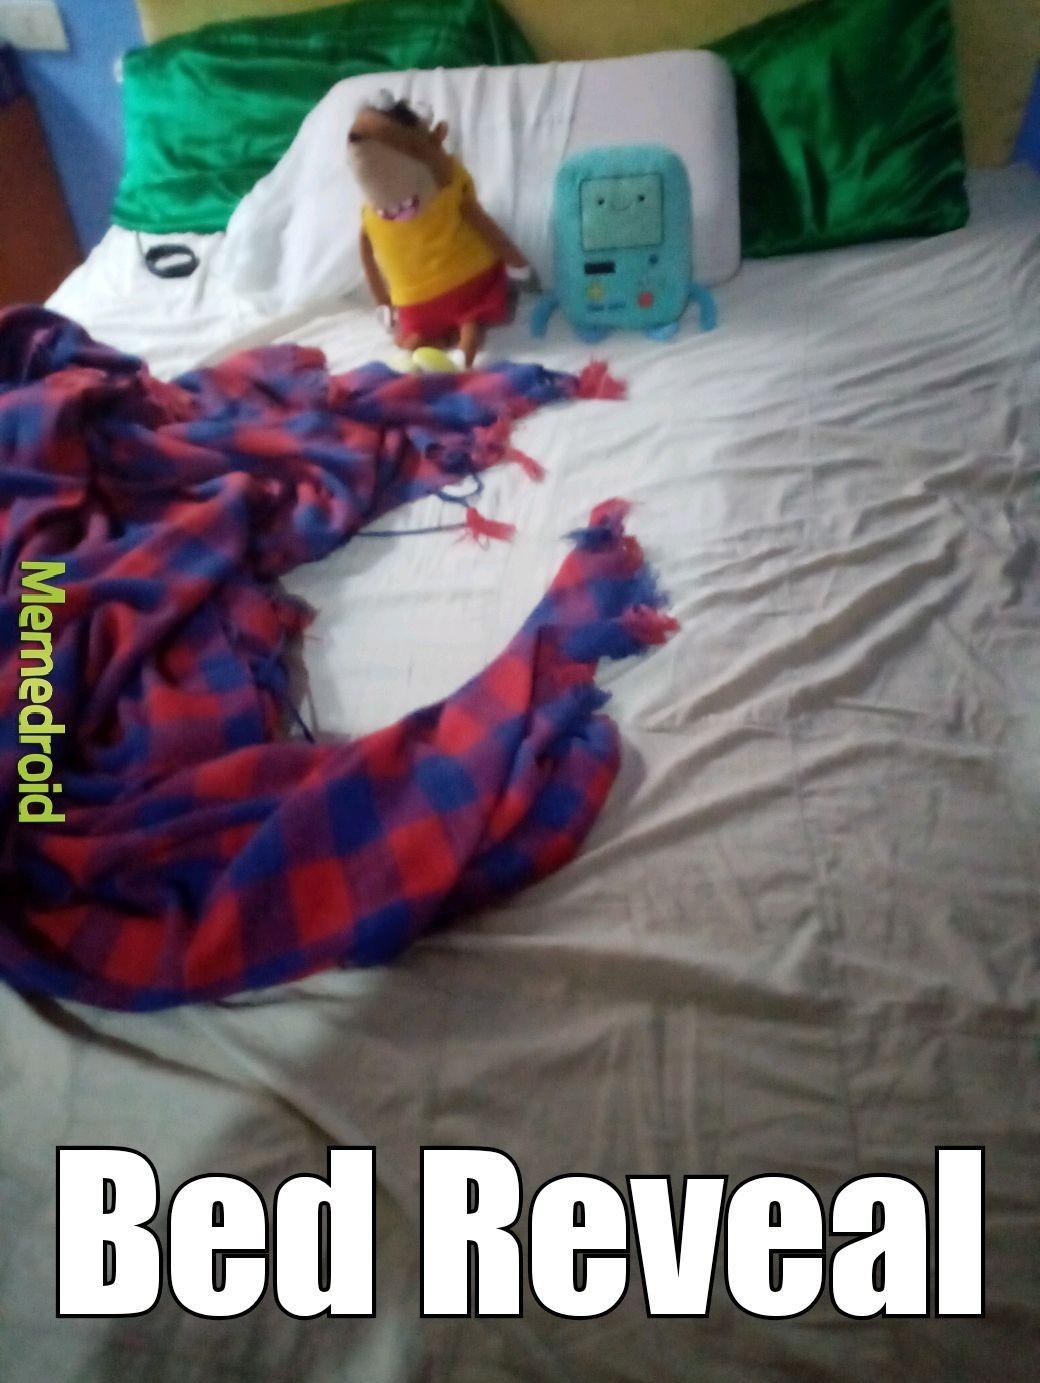 bed reveal - meme